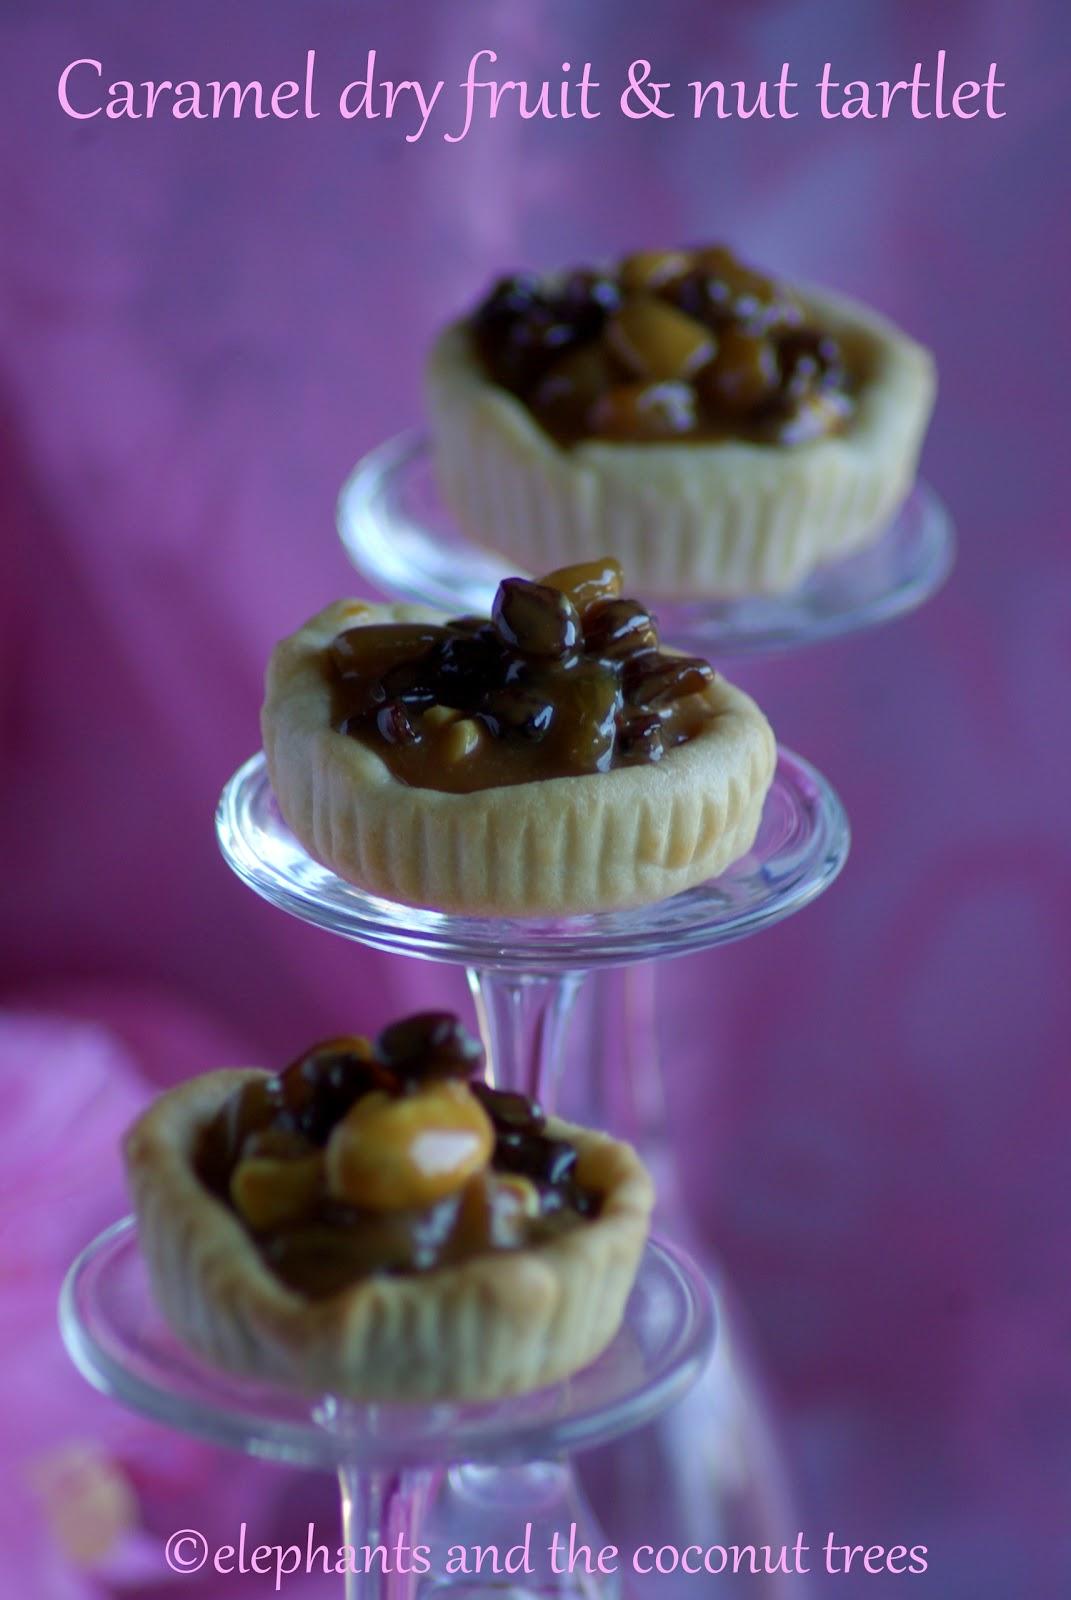 Dry fruit caramel tart / Caramel fruit and nut Tartlet / Mini tart ...